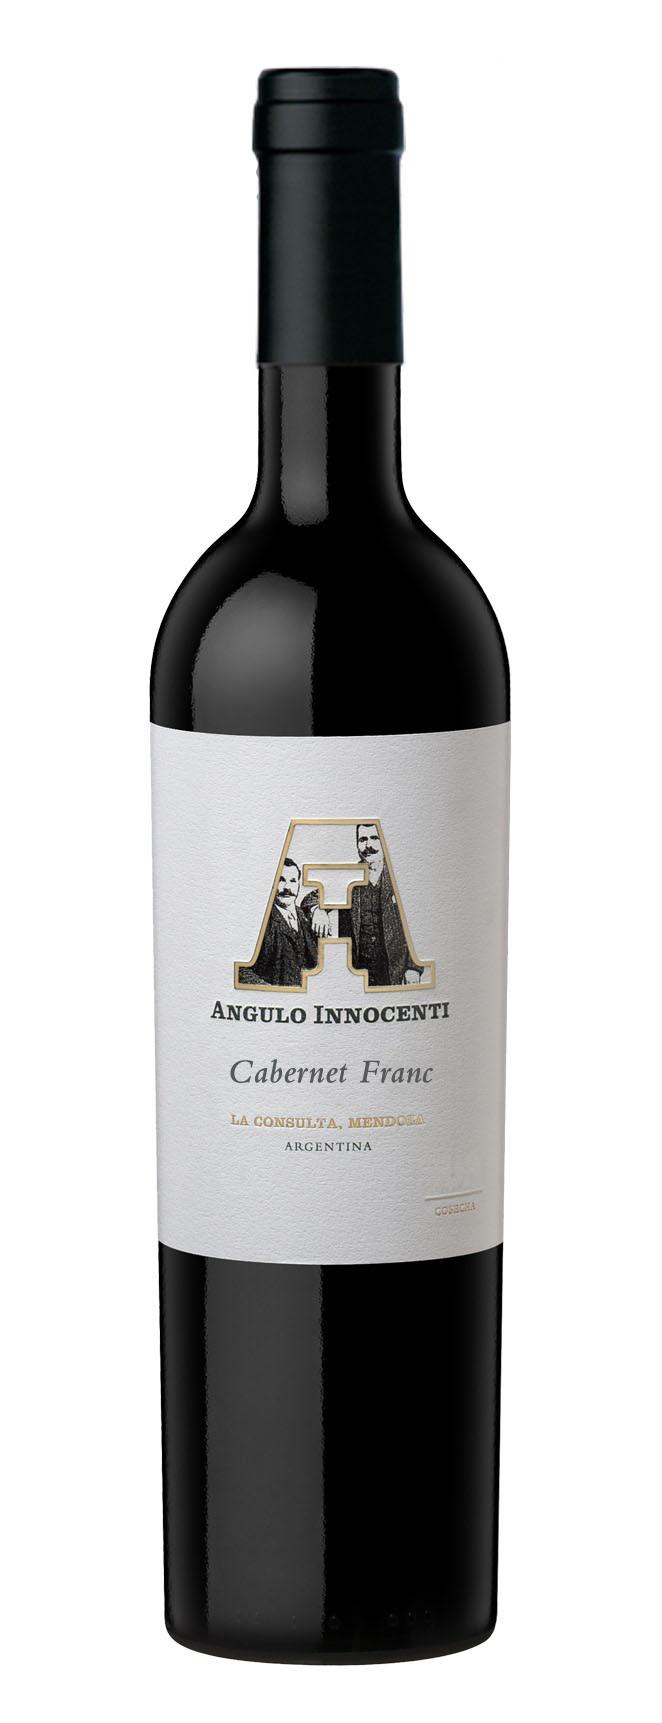 Angulo Innocenti Cabernet Franc